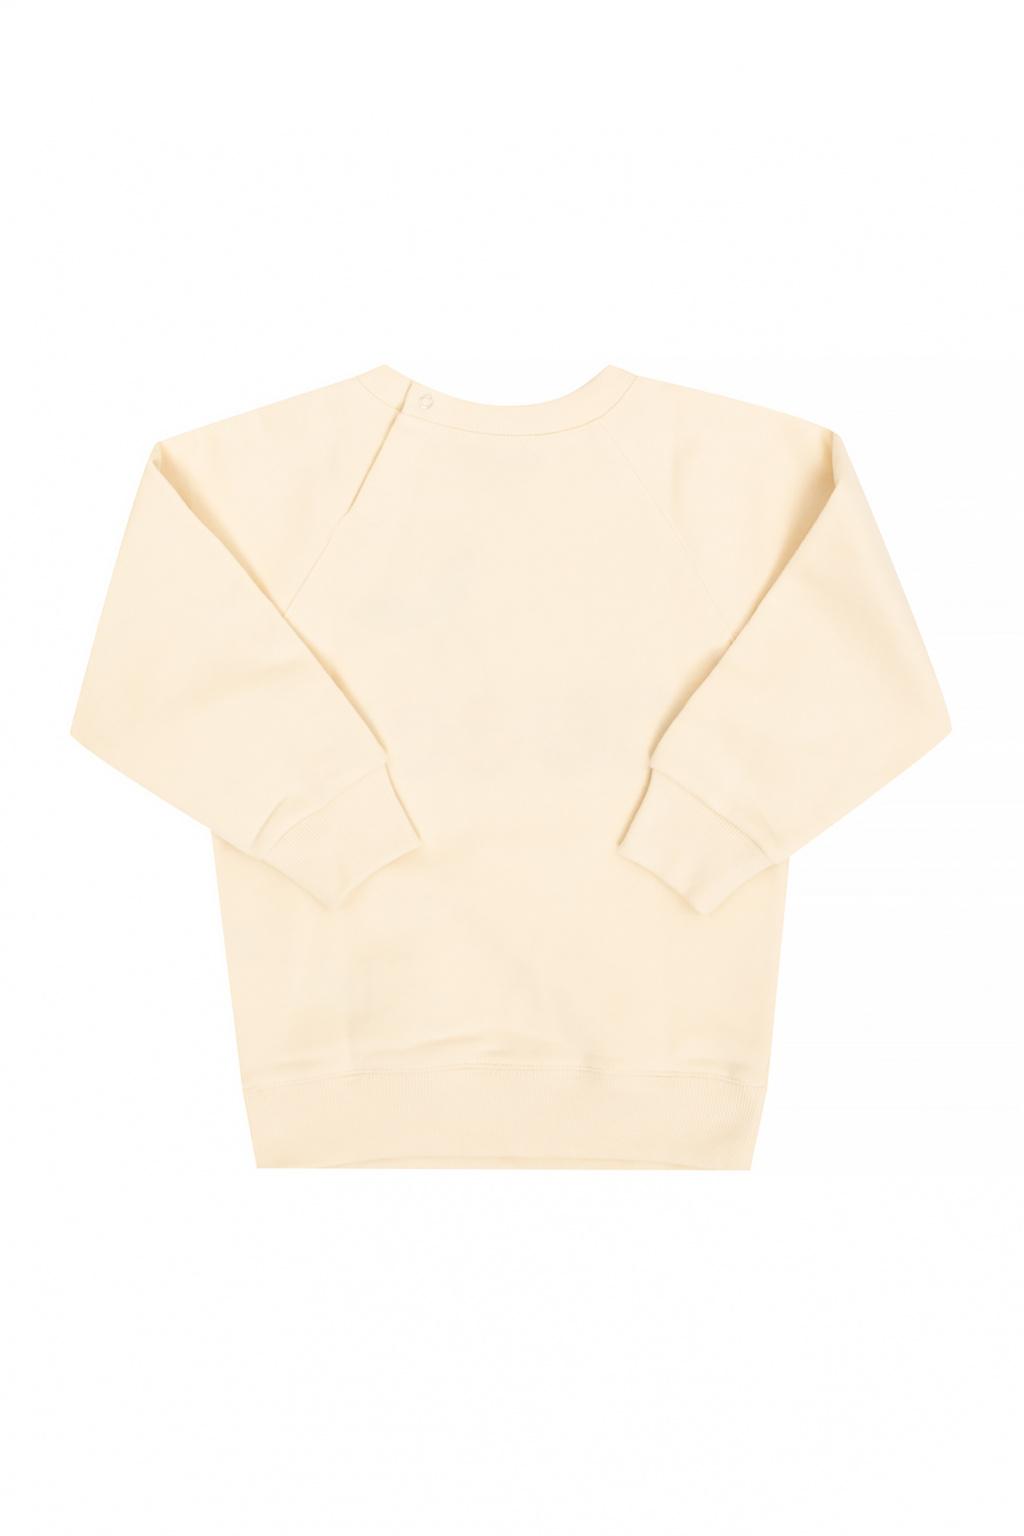 Gucci Kids Sweatshirt with logo